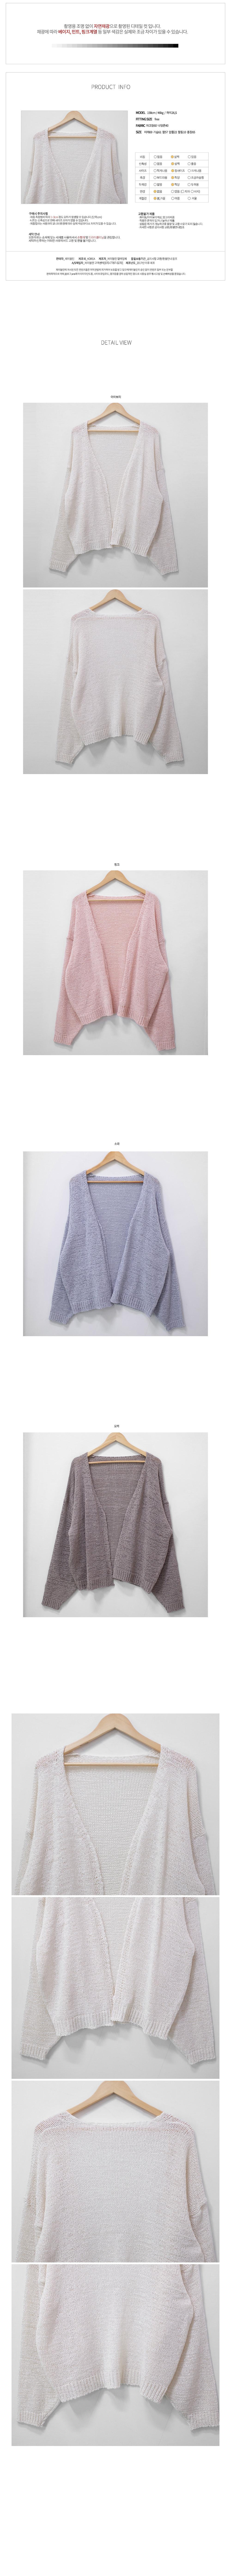 Parka Loose-fit cardigan